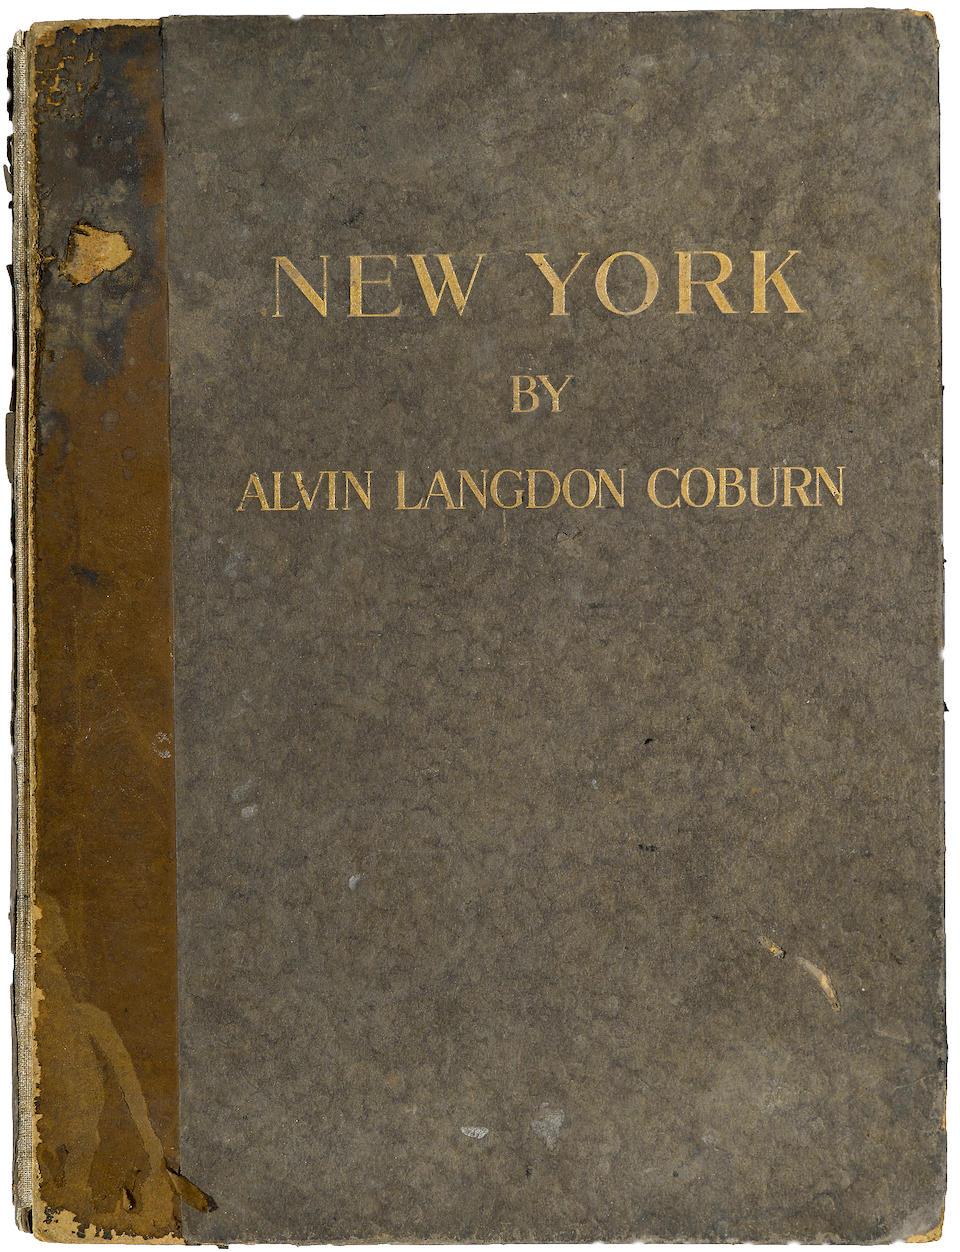 Alvin Langdon Coburn (1882-1966); New York;